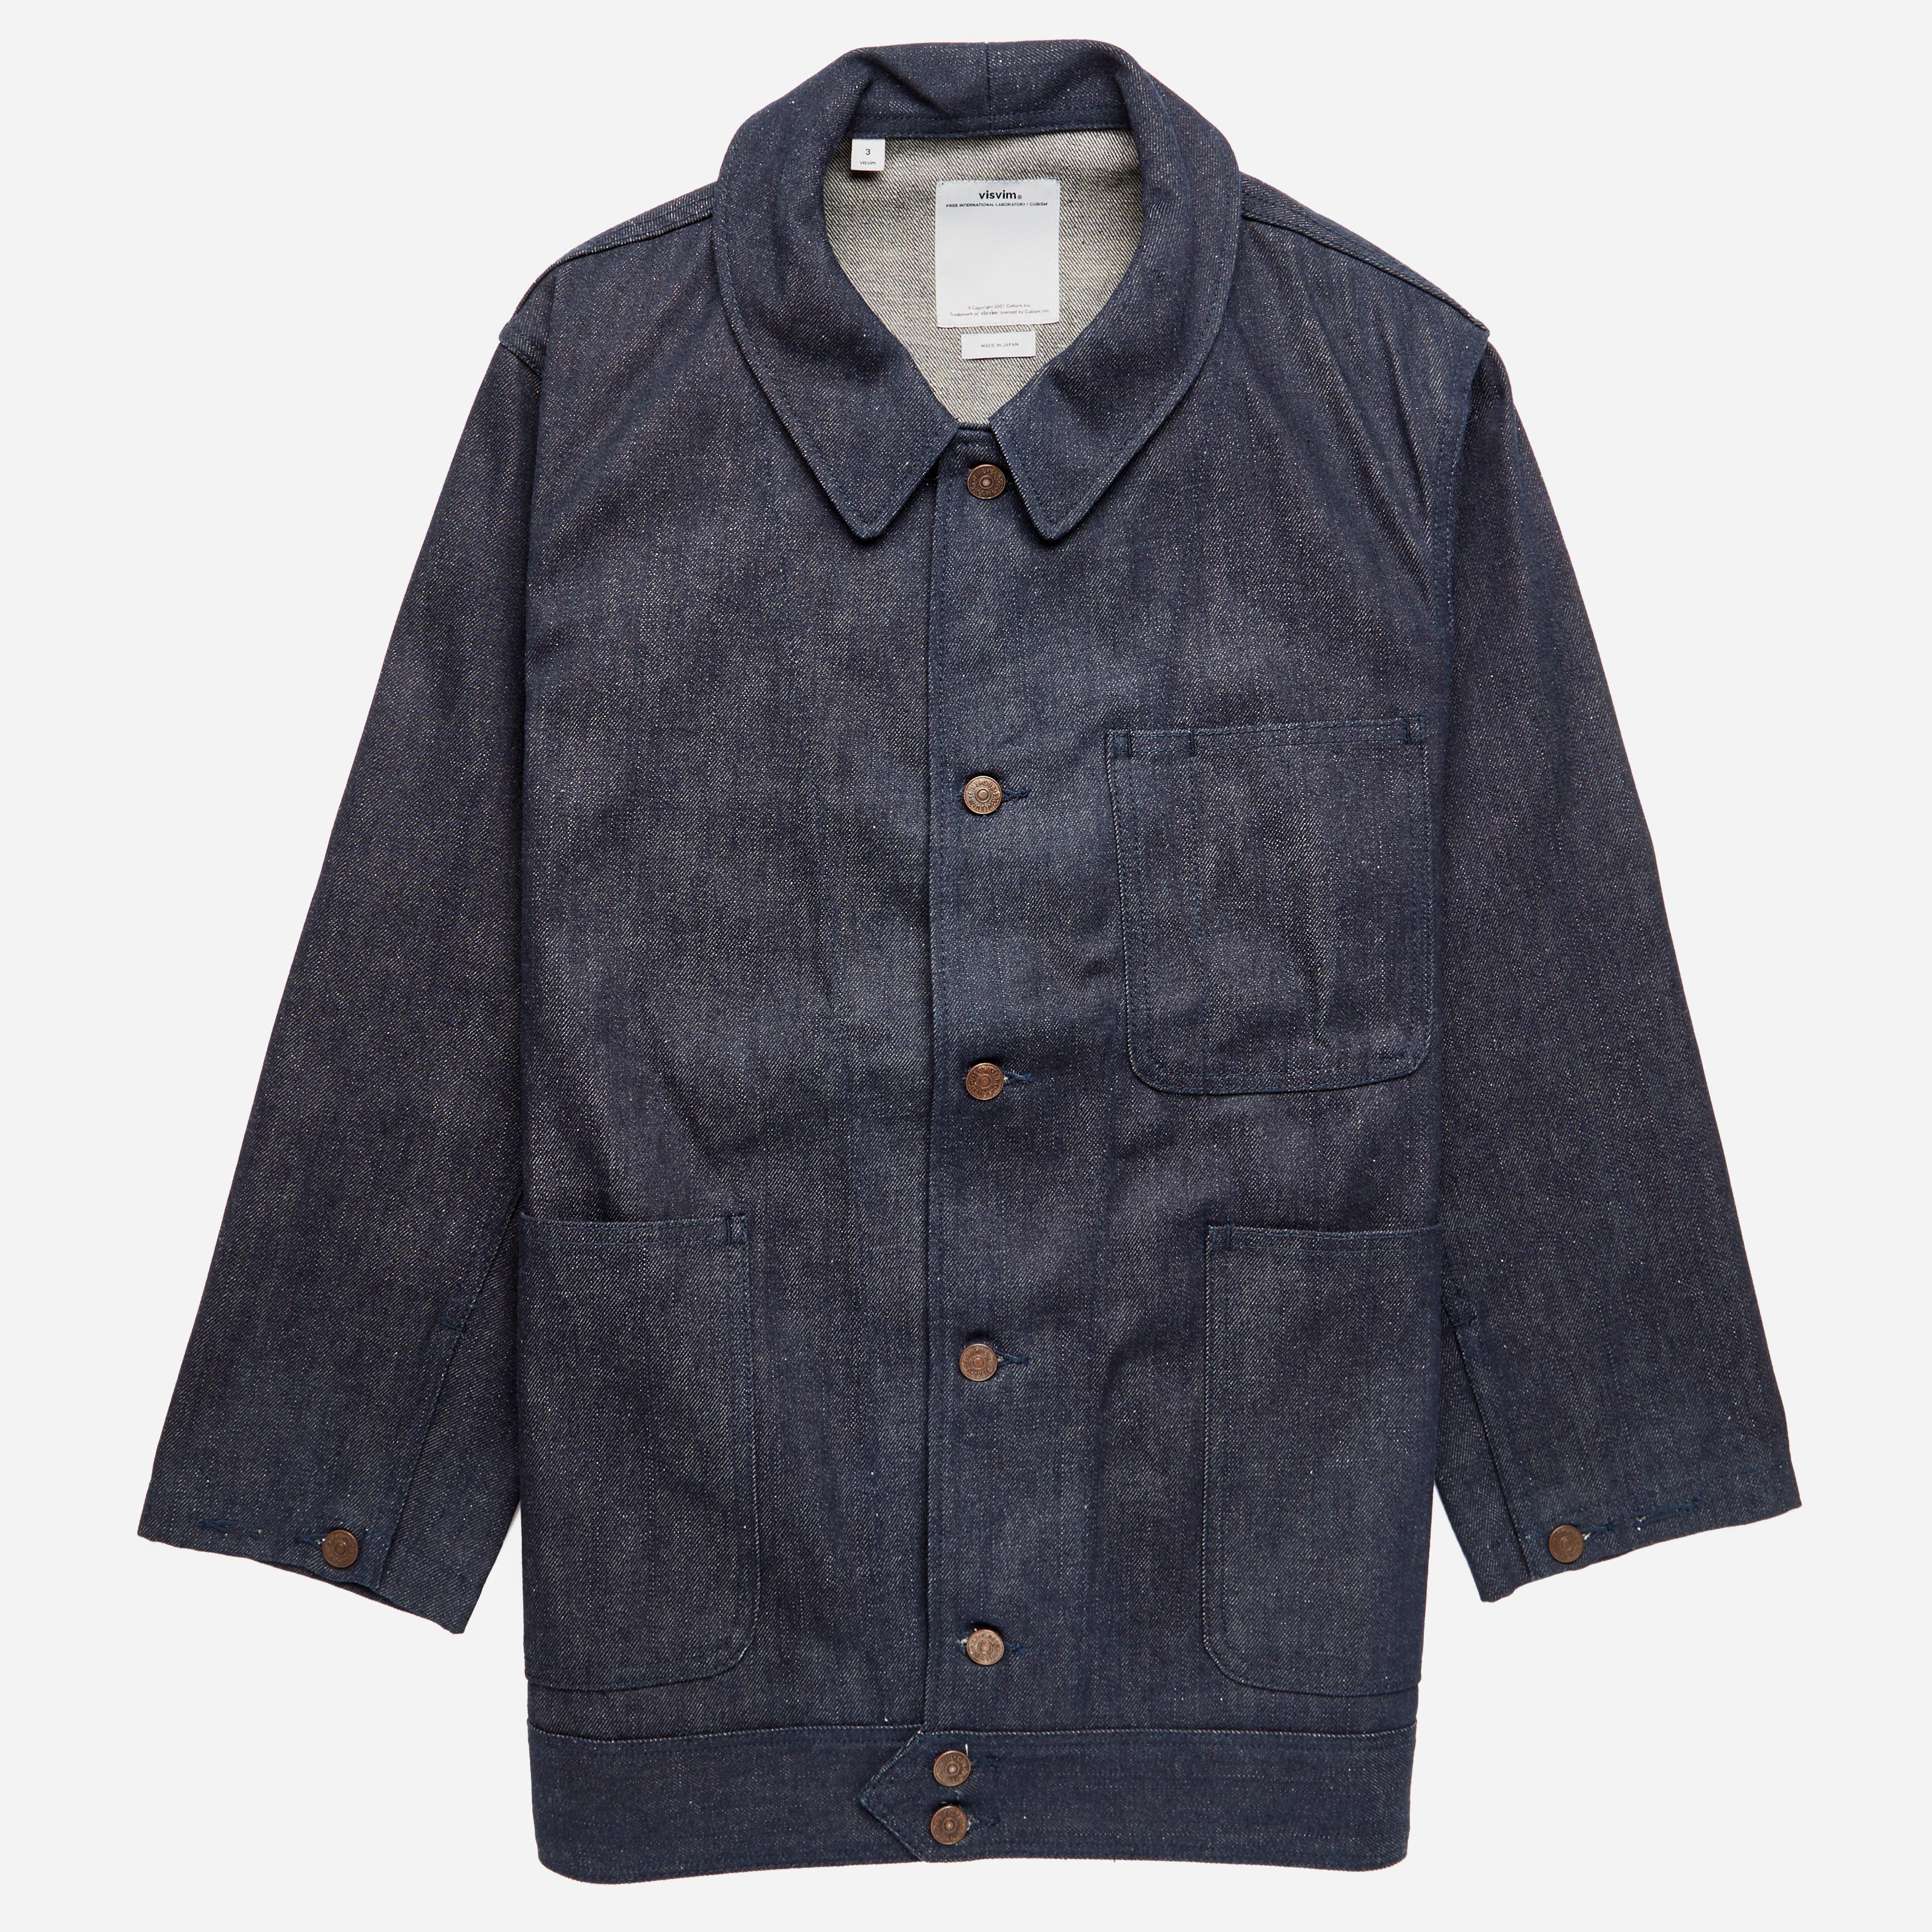 Visvim Benny Coverall Jacket